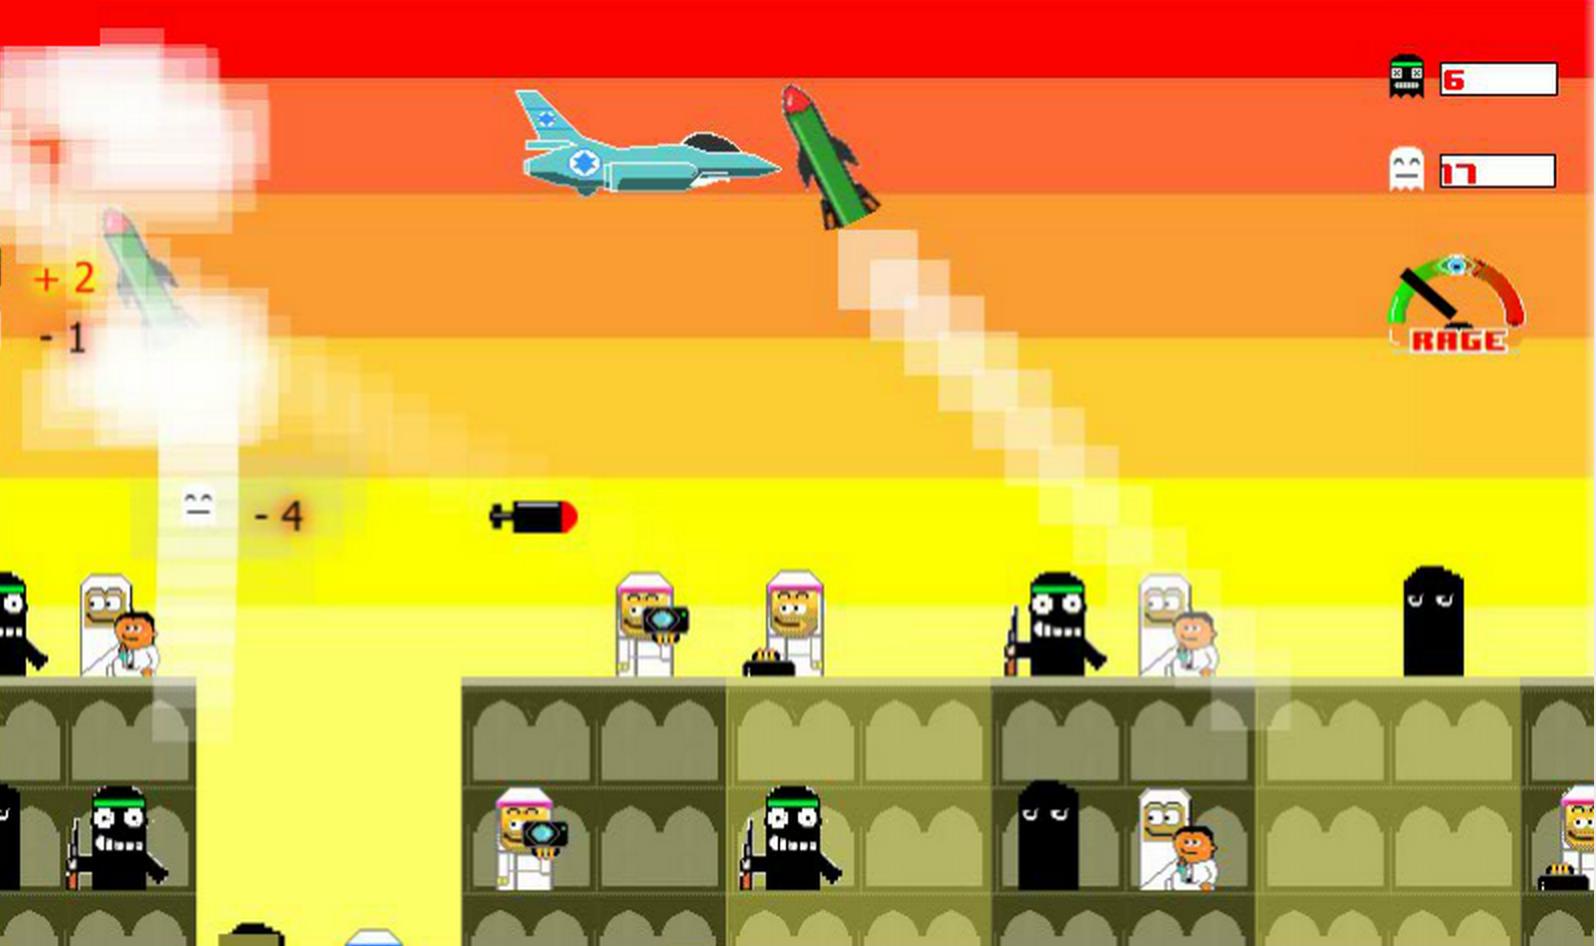 Bomb Gaza Game on Google Play